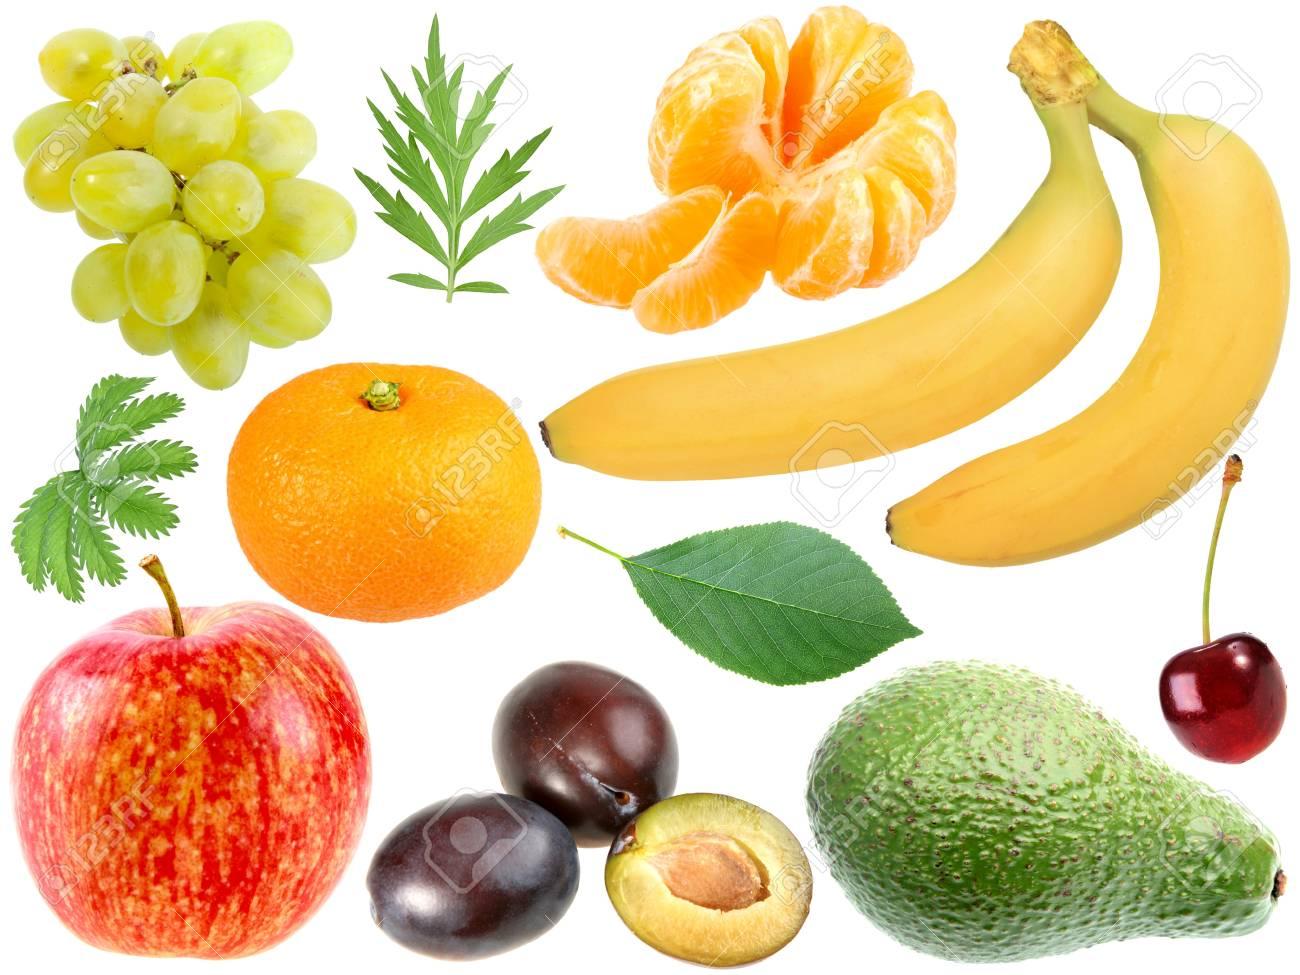 Set of fresh fruits and berryes. Isolated on white background. Close-up. Studio photography. Stock Photo - 12376438